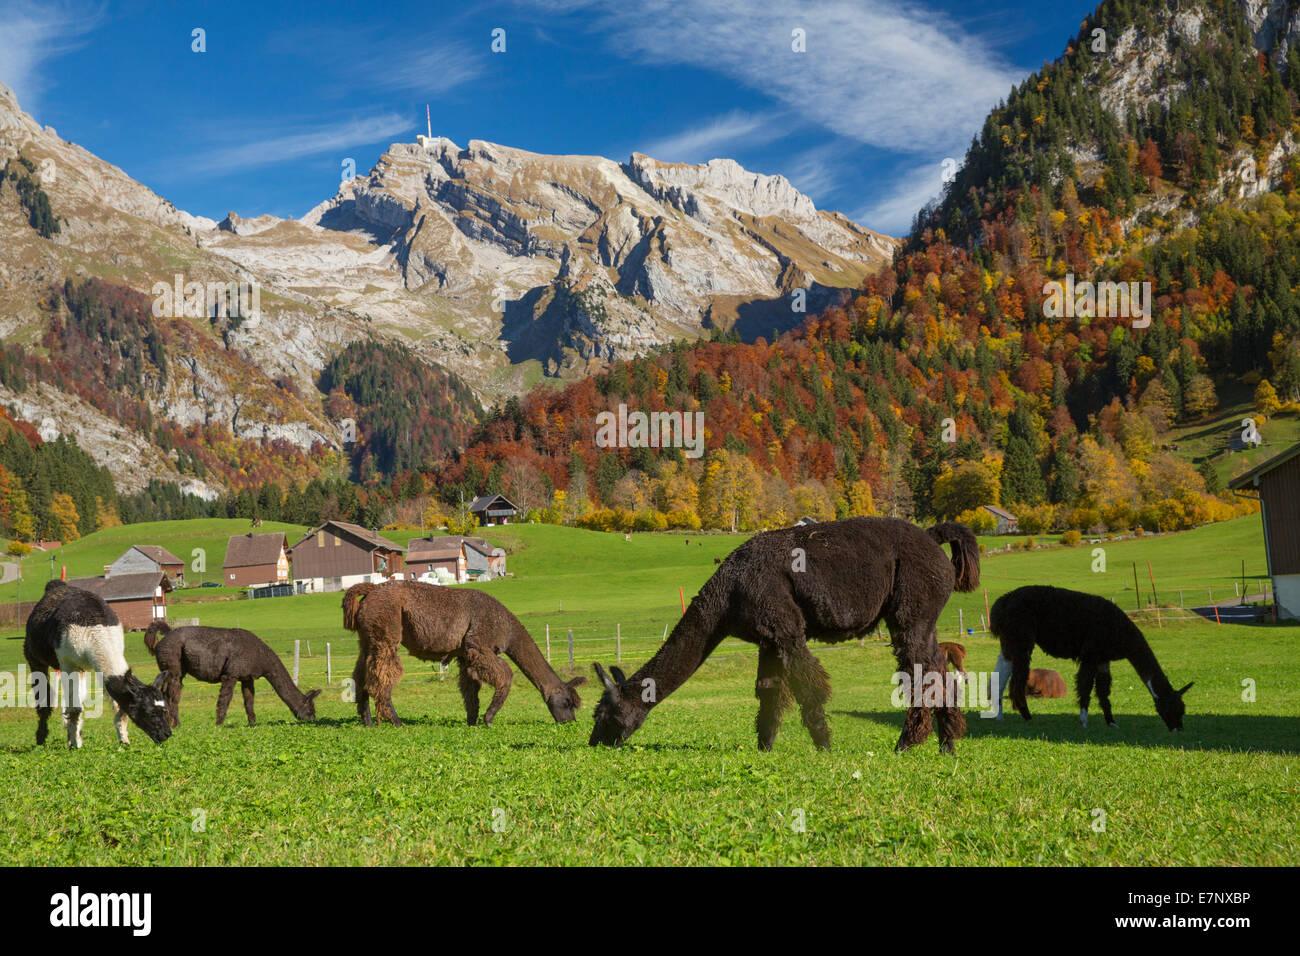 Toggenburg, llama, lama, Unterwasser, Toggenburg, Alpstein, Säntis, mountain, mountains, autumn, SG, canton - Stock Image